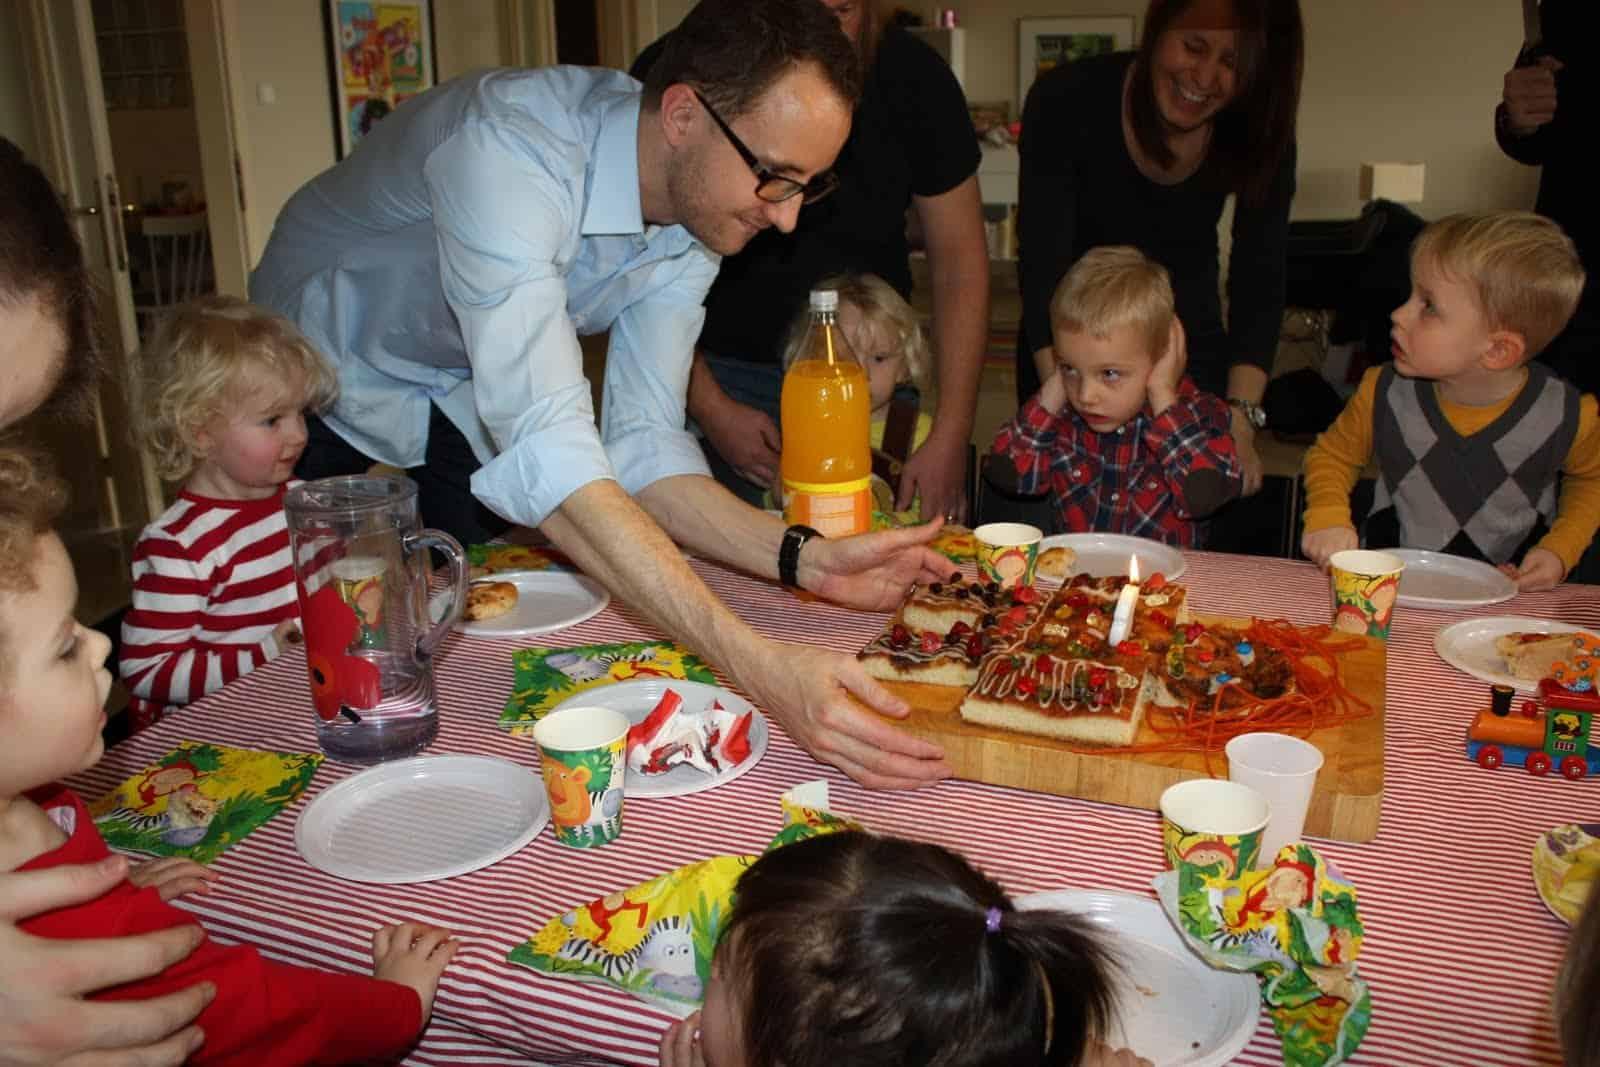 10 Baffling Birthday Traditions From Around The World